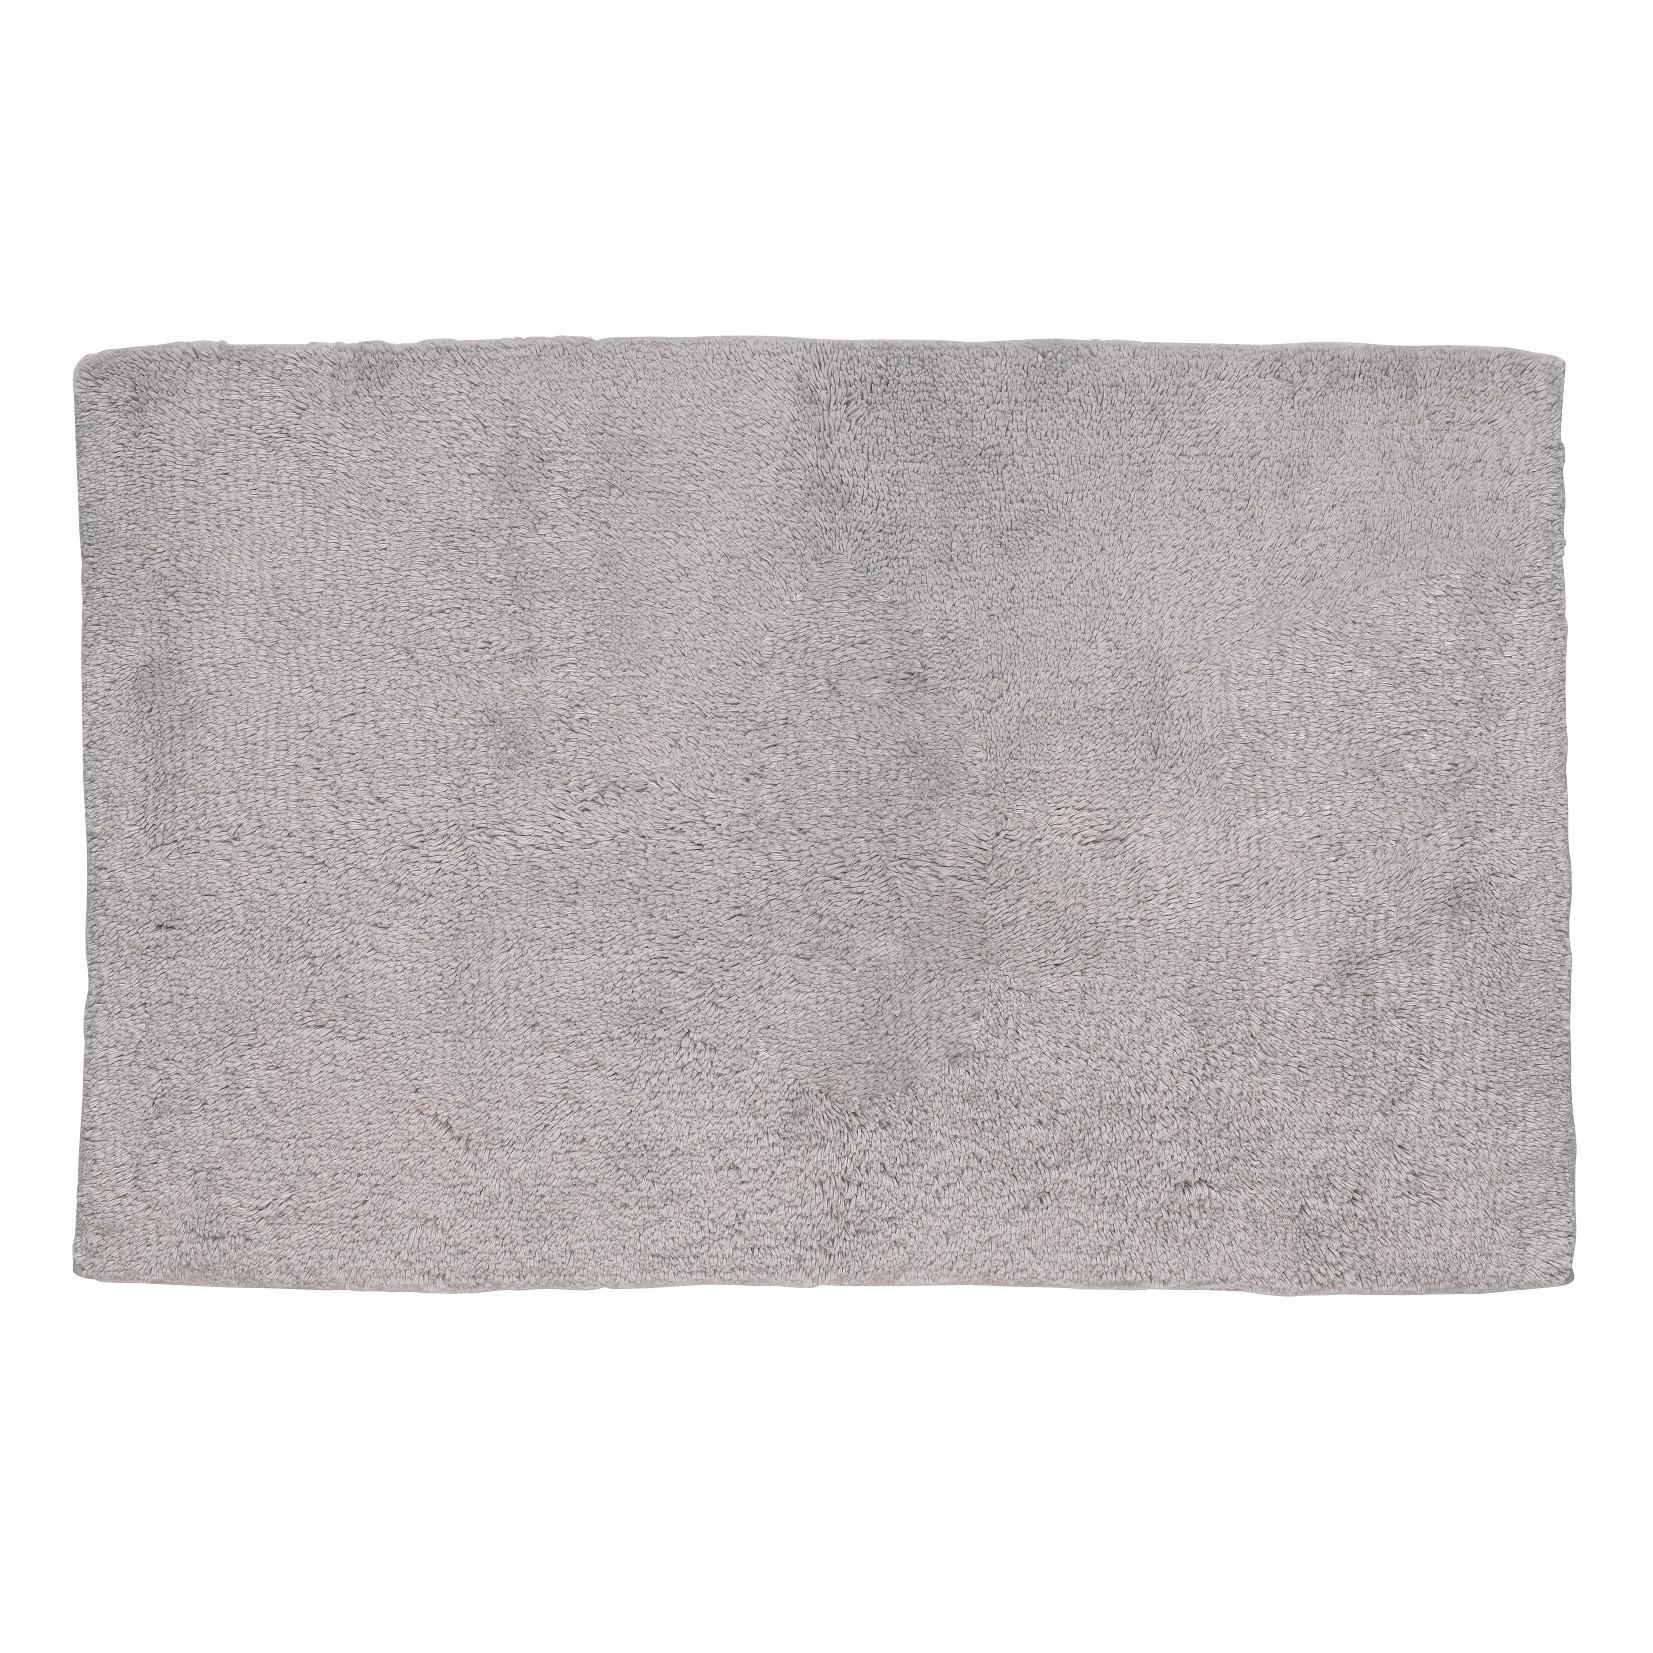 Tapis de Bain Ladessa Uni Gris Clair | 100 x 60 x 2 cm